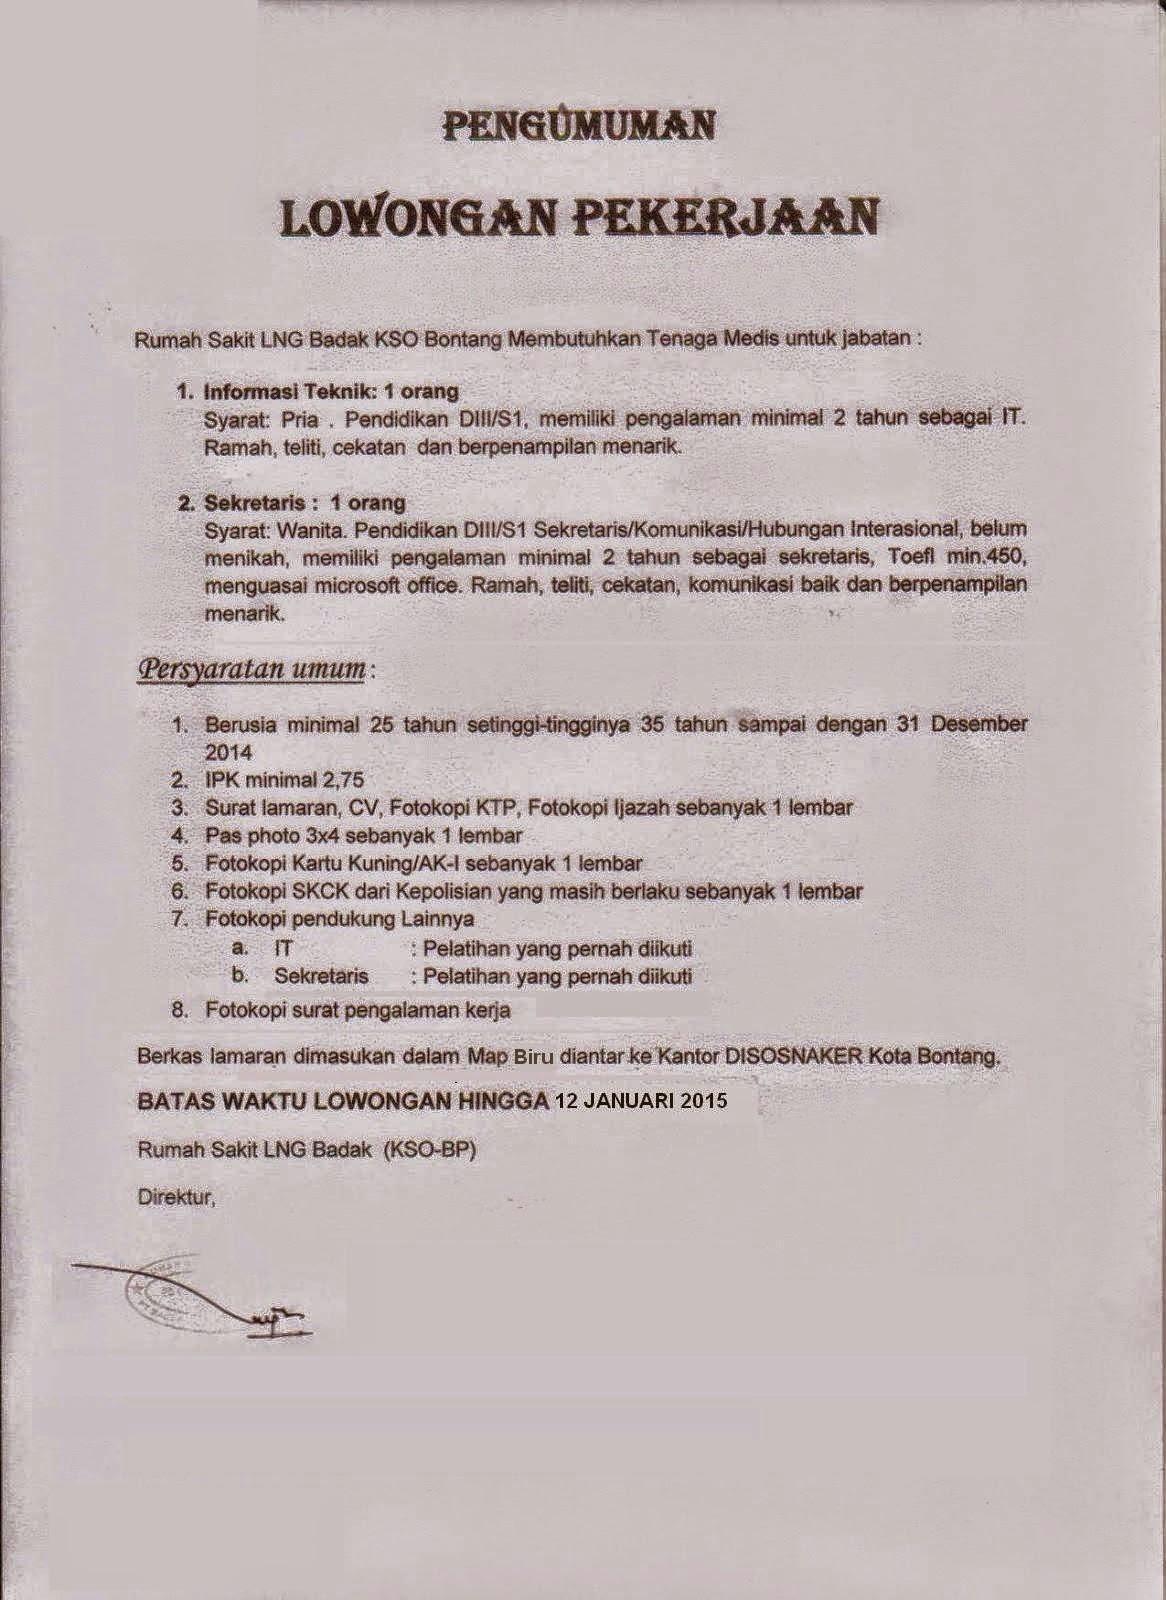 Lowongan Kerja Bontang Januari 2015 Terbaru : Rumah Sakit LNG Badak KSO Bontang